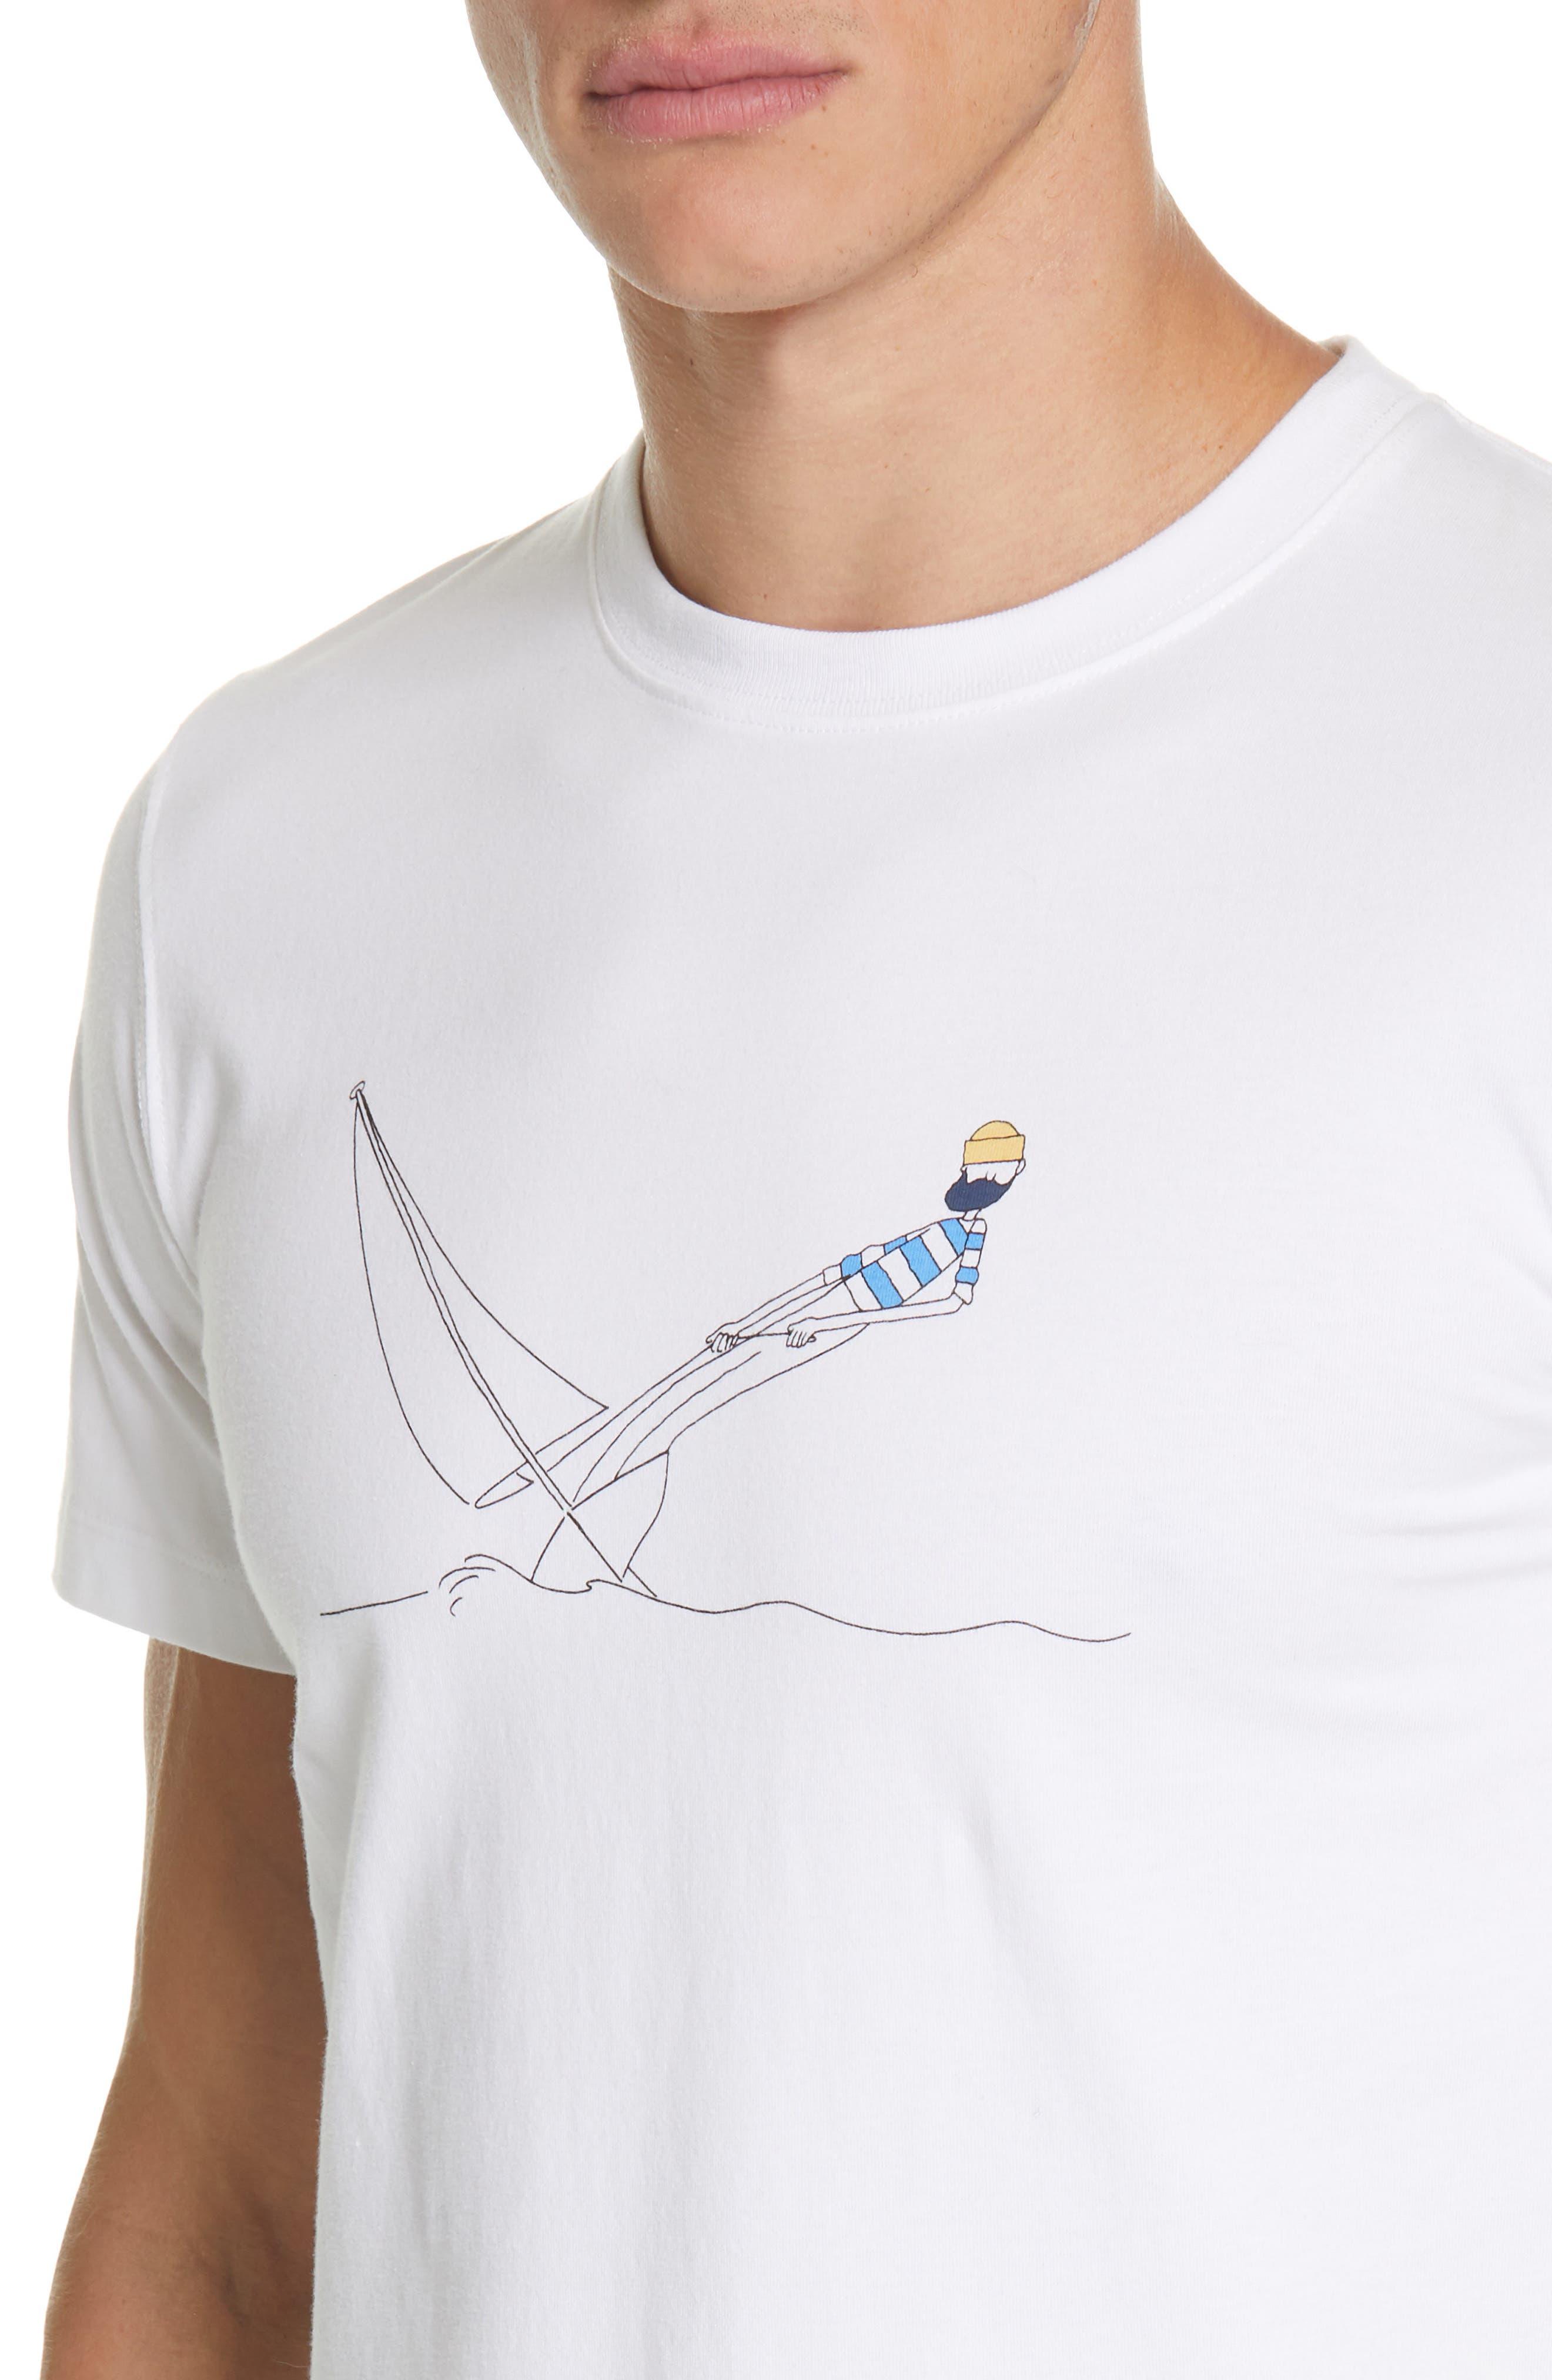 Daniel Frost - Hanging Graphic T-Shirt,                             Alternate thumbnail 4, color,                             WHITE